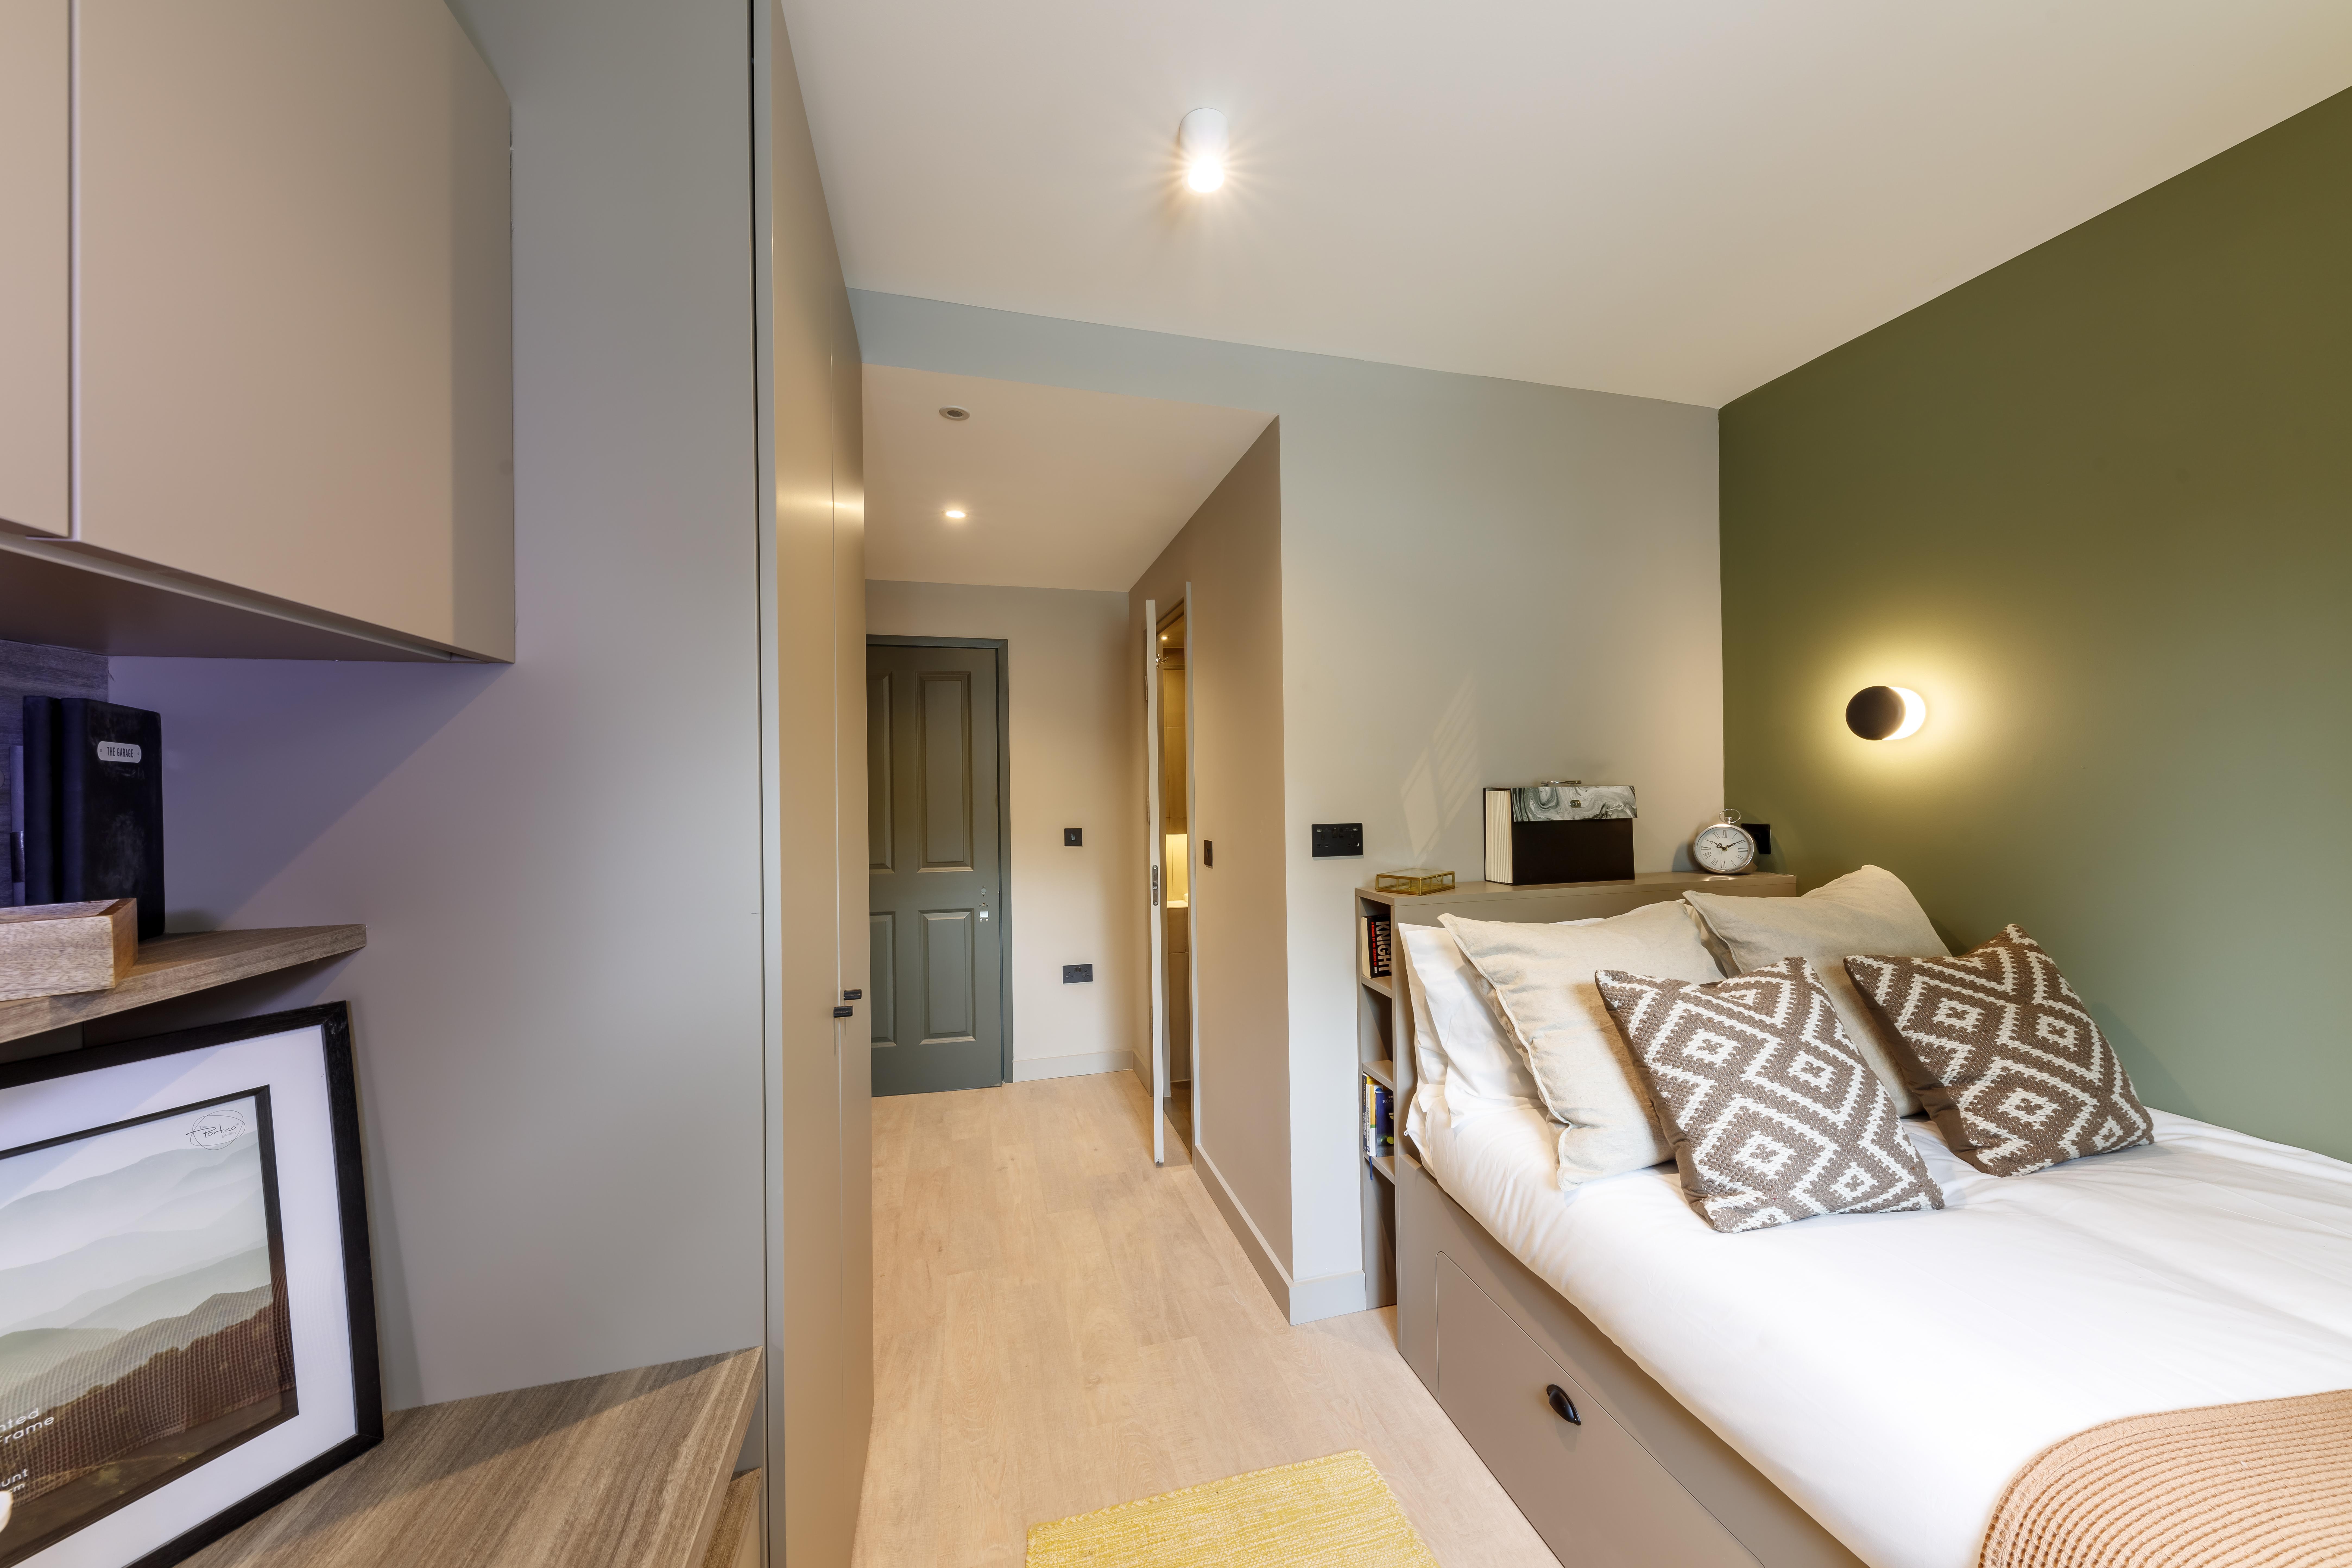 egham student accommodation